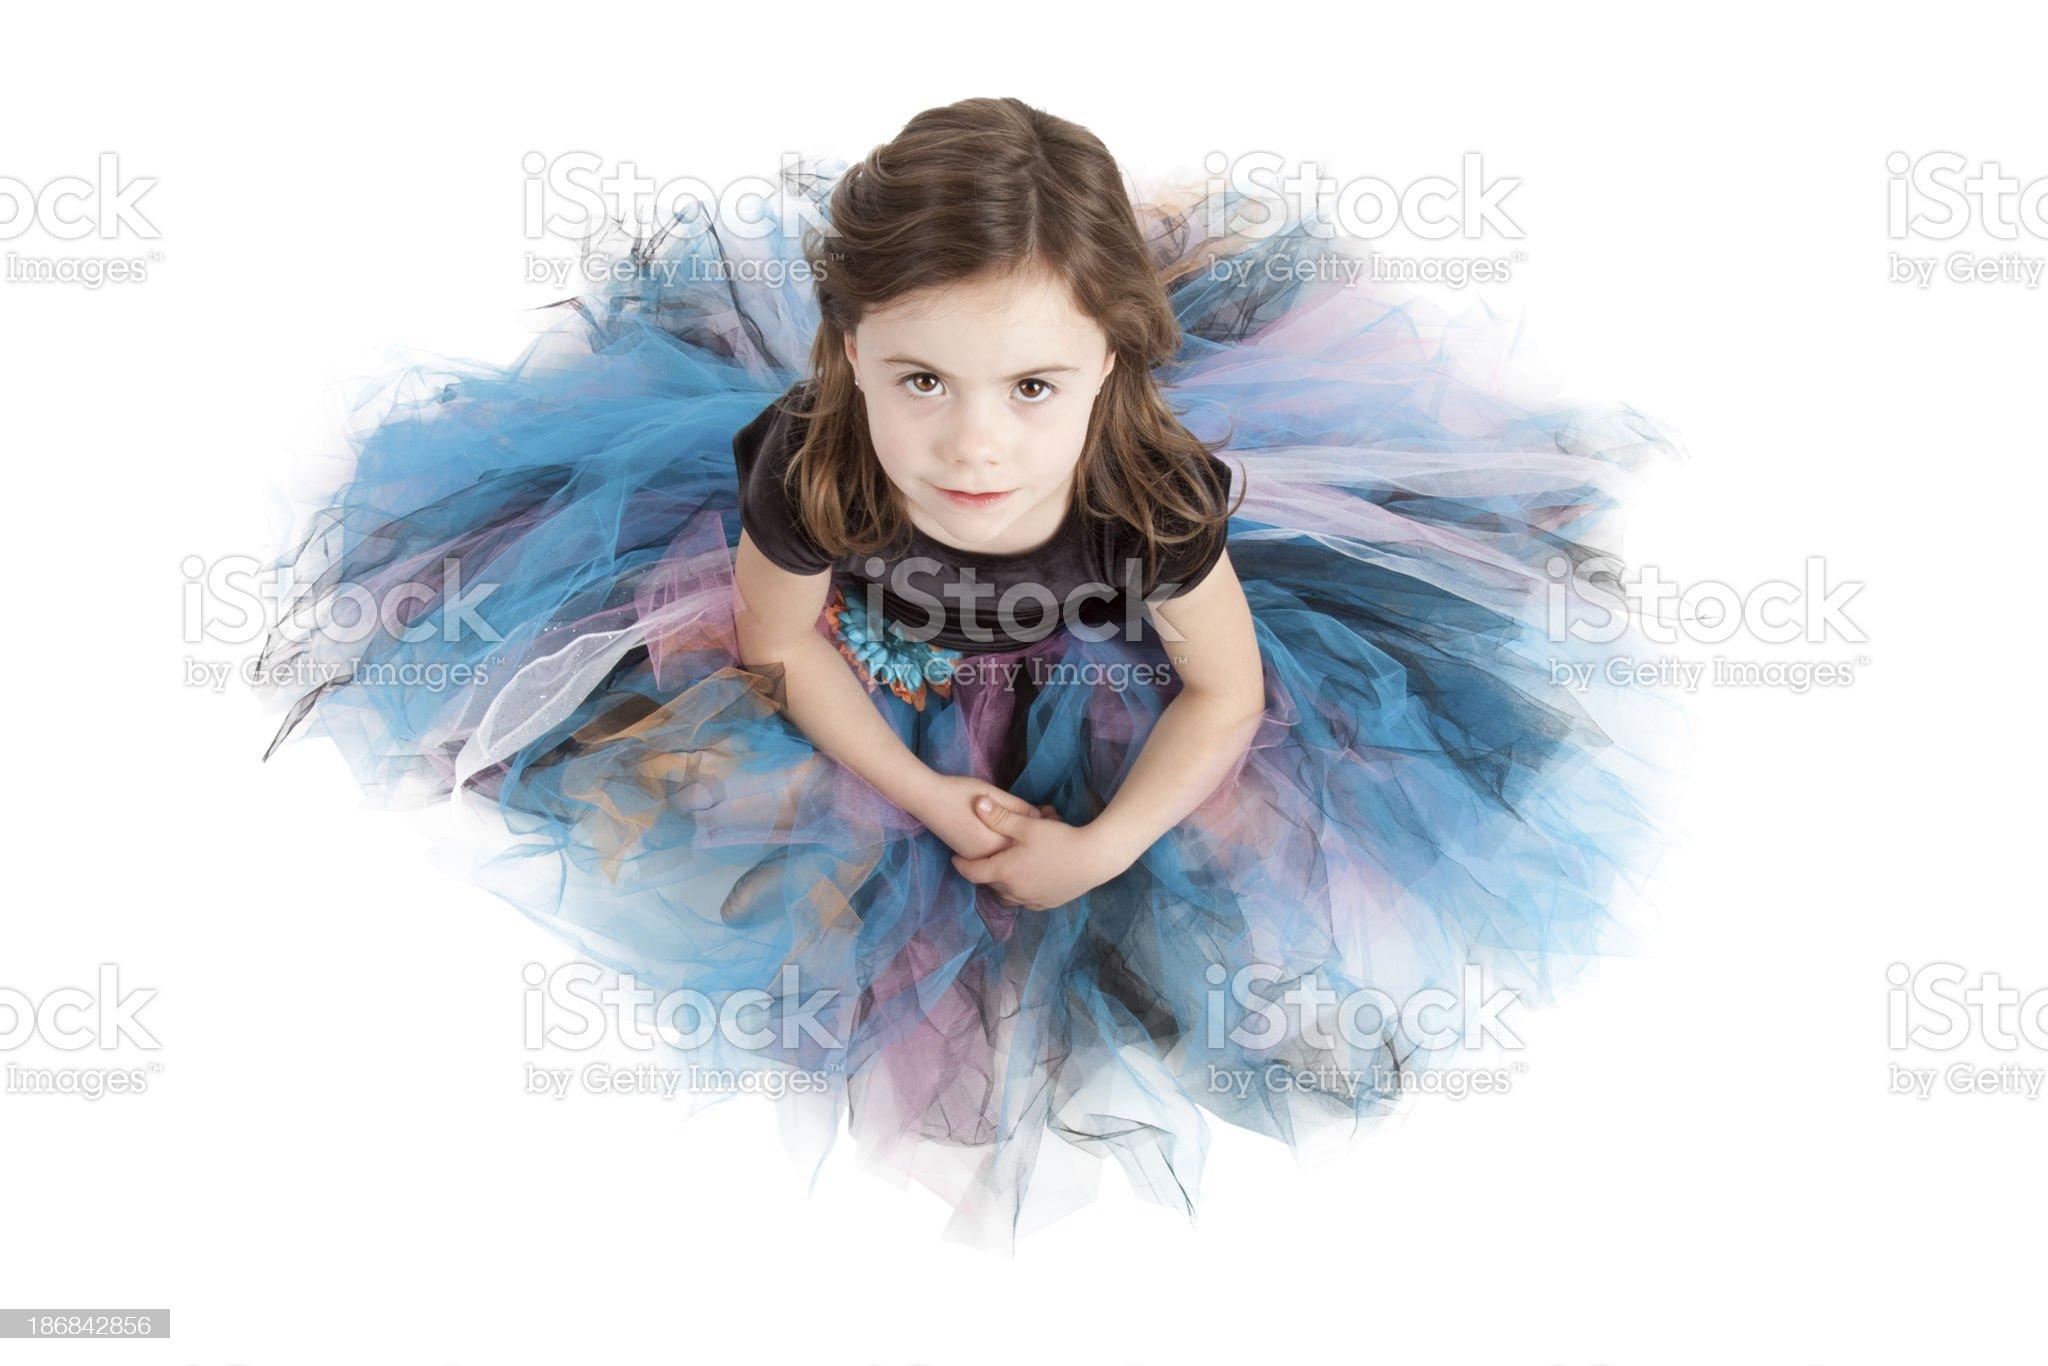 Little Girl Sitting on White Background Wearing Tutu Looking Up royalty-free stock photo